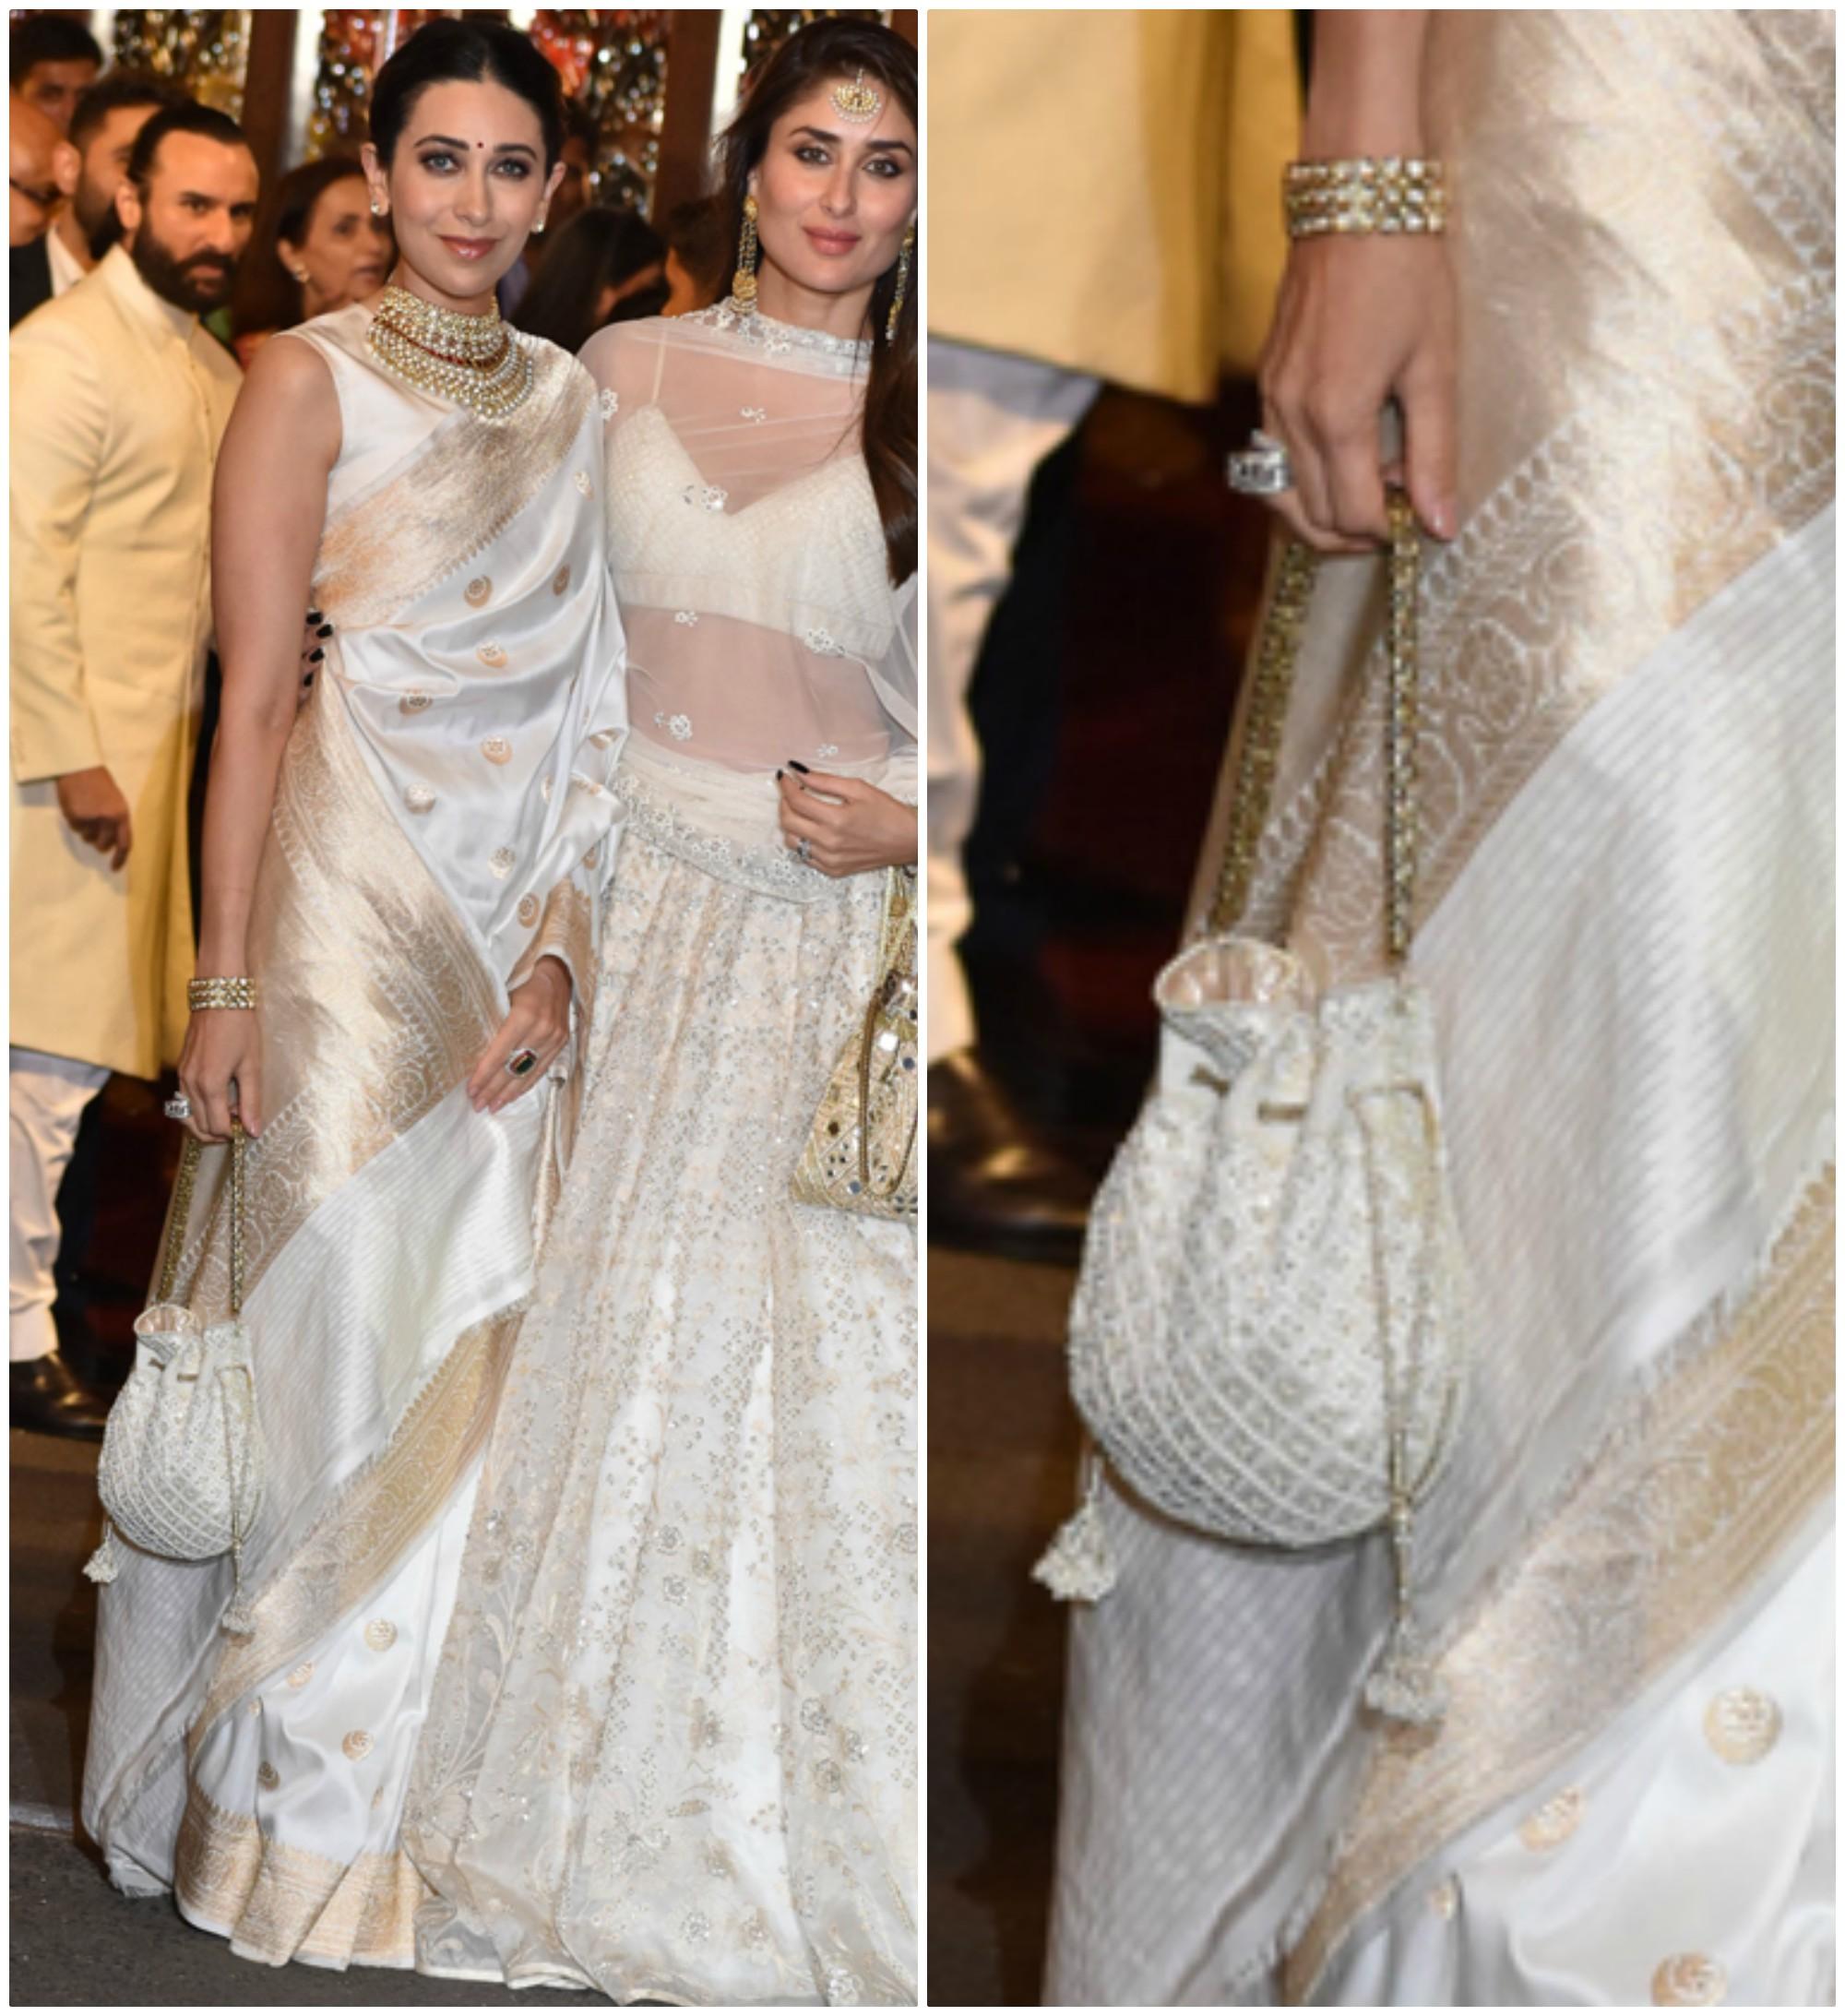 PunjabKesari, Fabric's Velvet Potli Bag Image ,फैब्रिक वेलवेट पोल्टी बैग इमेज